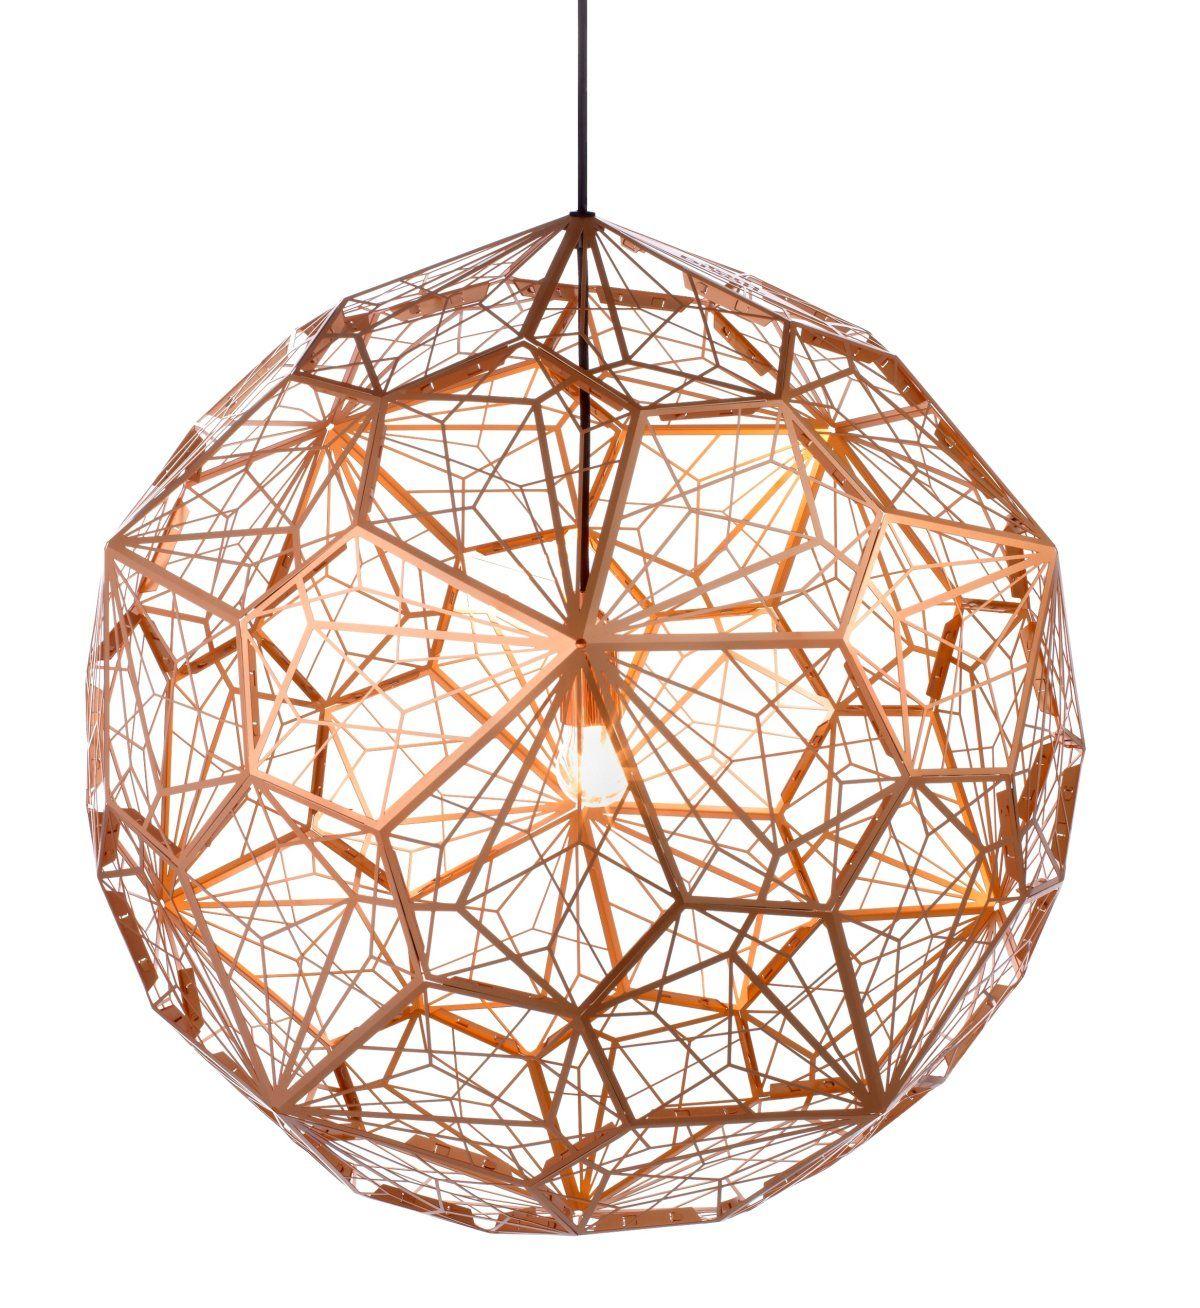 copper lighting pendants.  Lighting Etch Light Web Copper By Tomdixon Tom Dixon Pendant  Lampu2026 In Lighting Pendants N